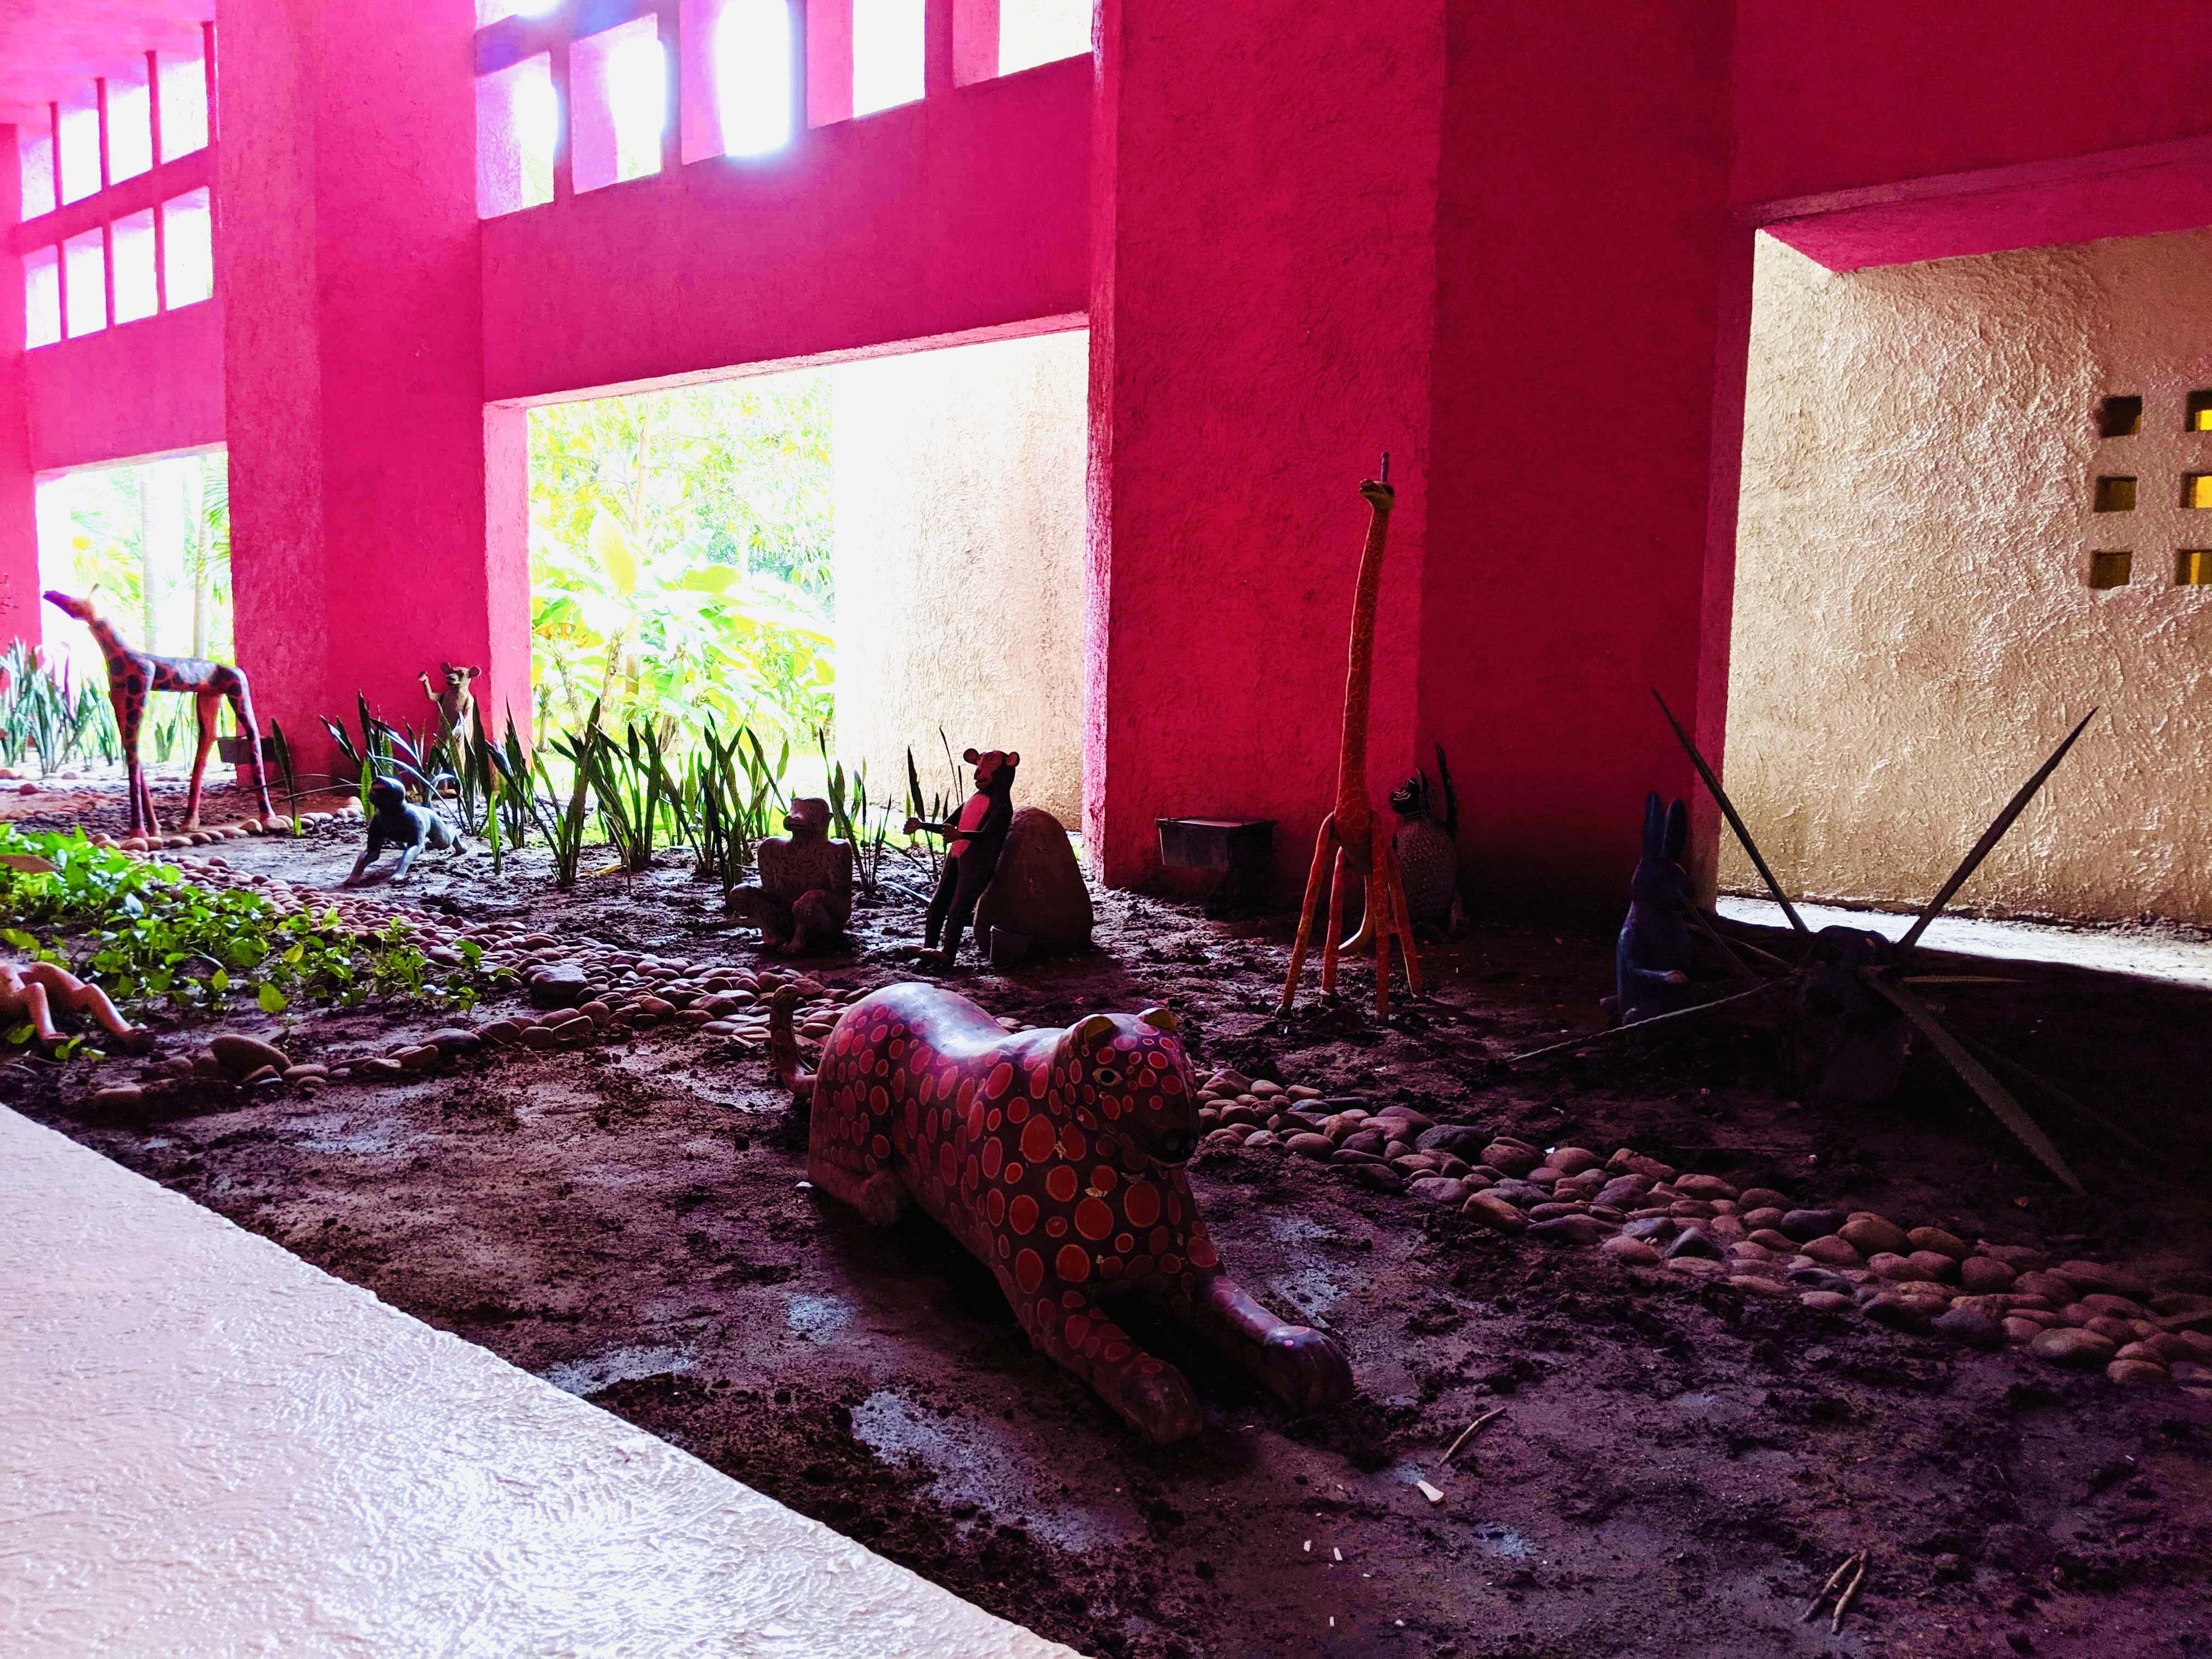 A sculpture of a big cat in the sand